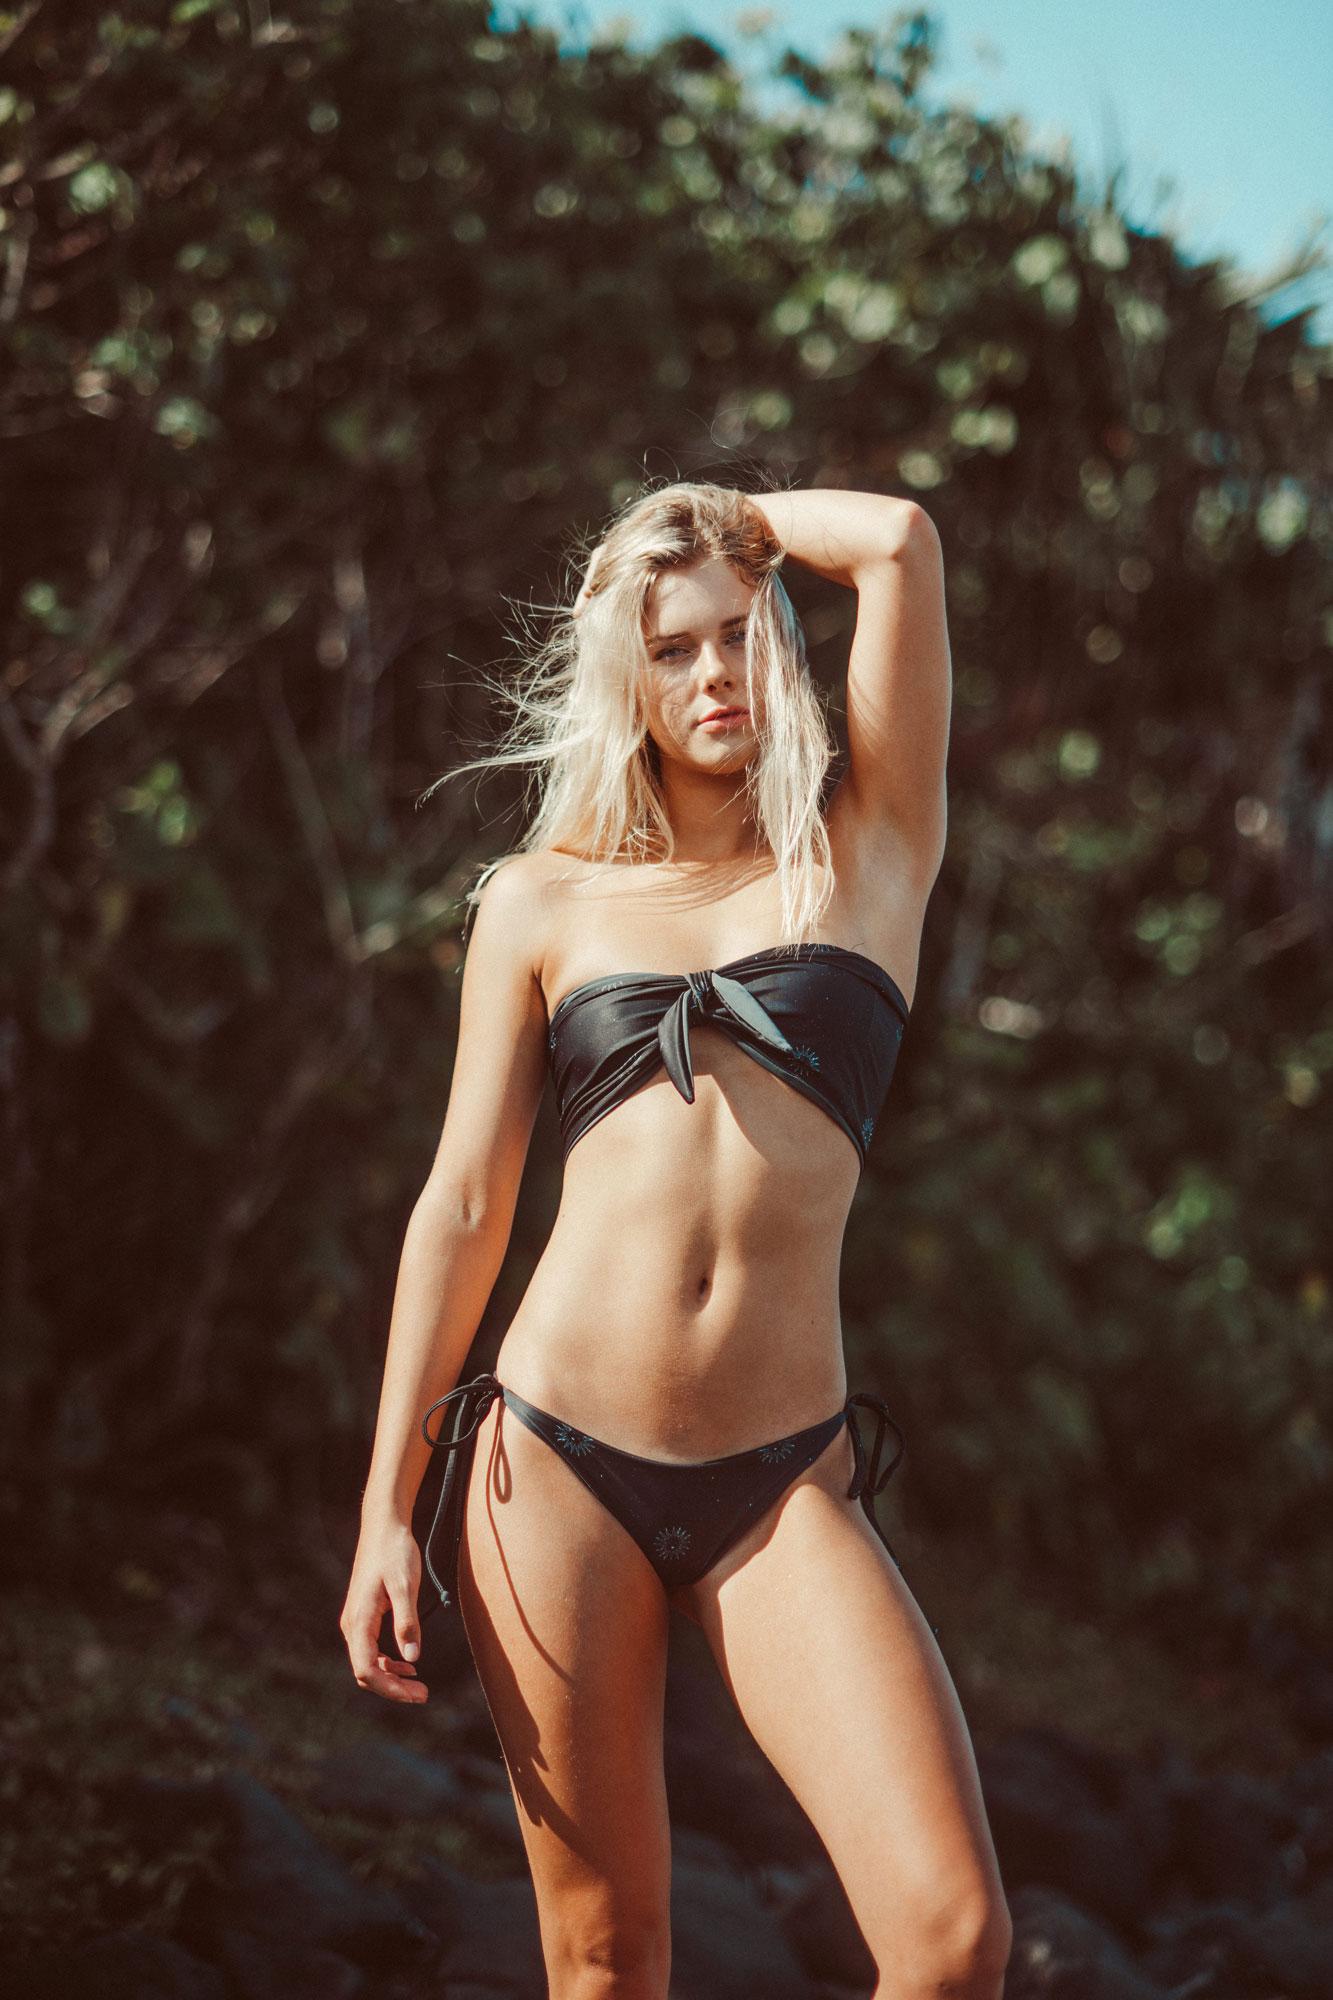 Ethical-Fashion-Bandeau-Bikini-Swimwear-Lily-Goodare-Gold-Coast-Model-by-Photographer-Kim-Akrigg-in-Liar-the-Label.jpg